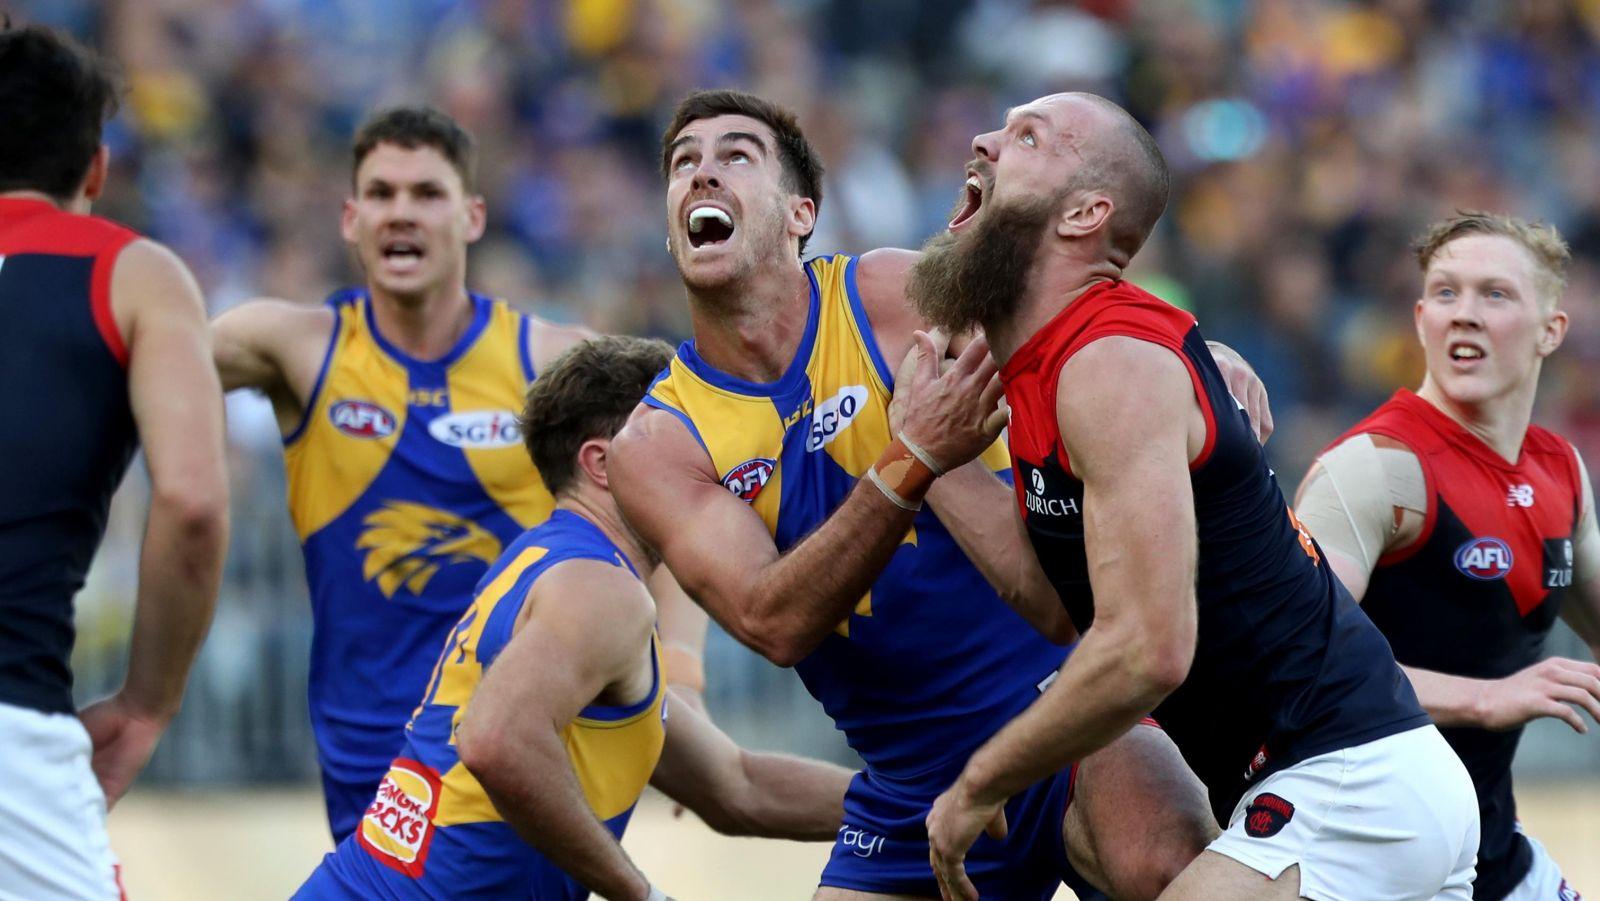 Second Preliminary Final: Eagles vs Demons AFL DFS Lineup Tips